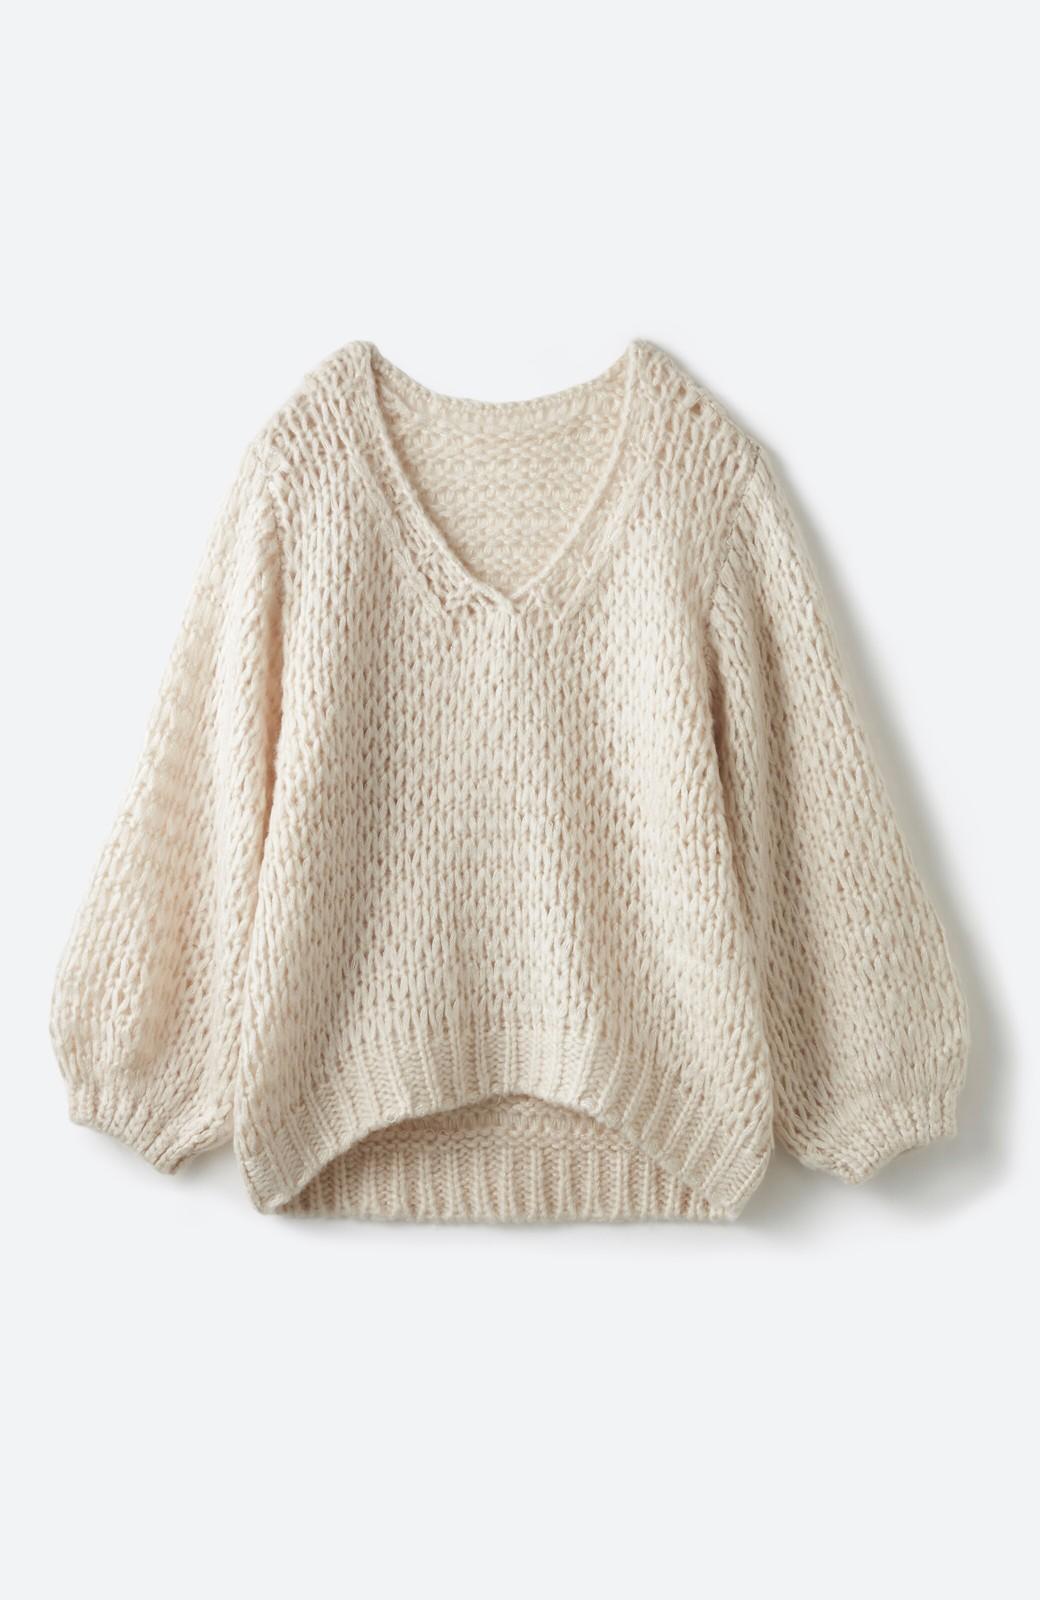 haco! 手編み風のざっくり感で女っぽい Vネックの甘編みルーズニット <アイボリー>の商品写真1